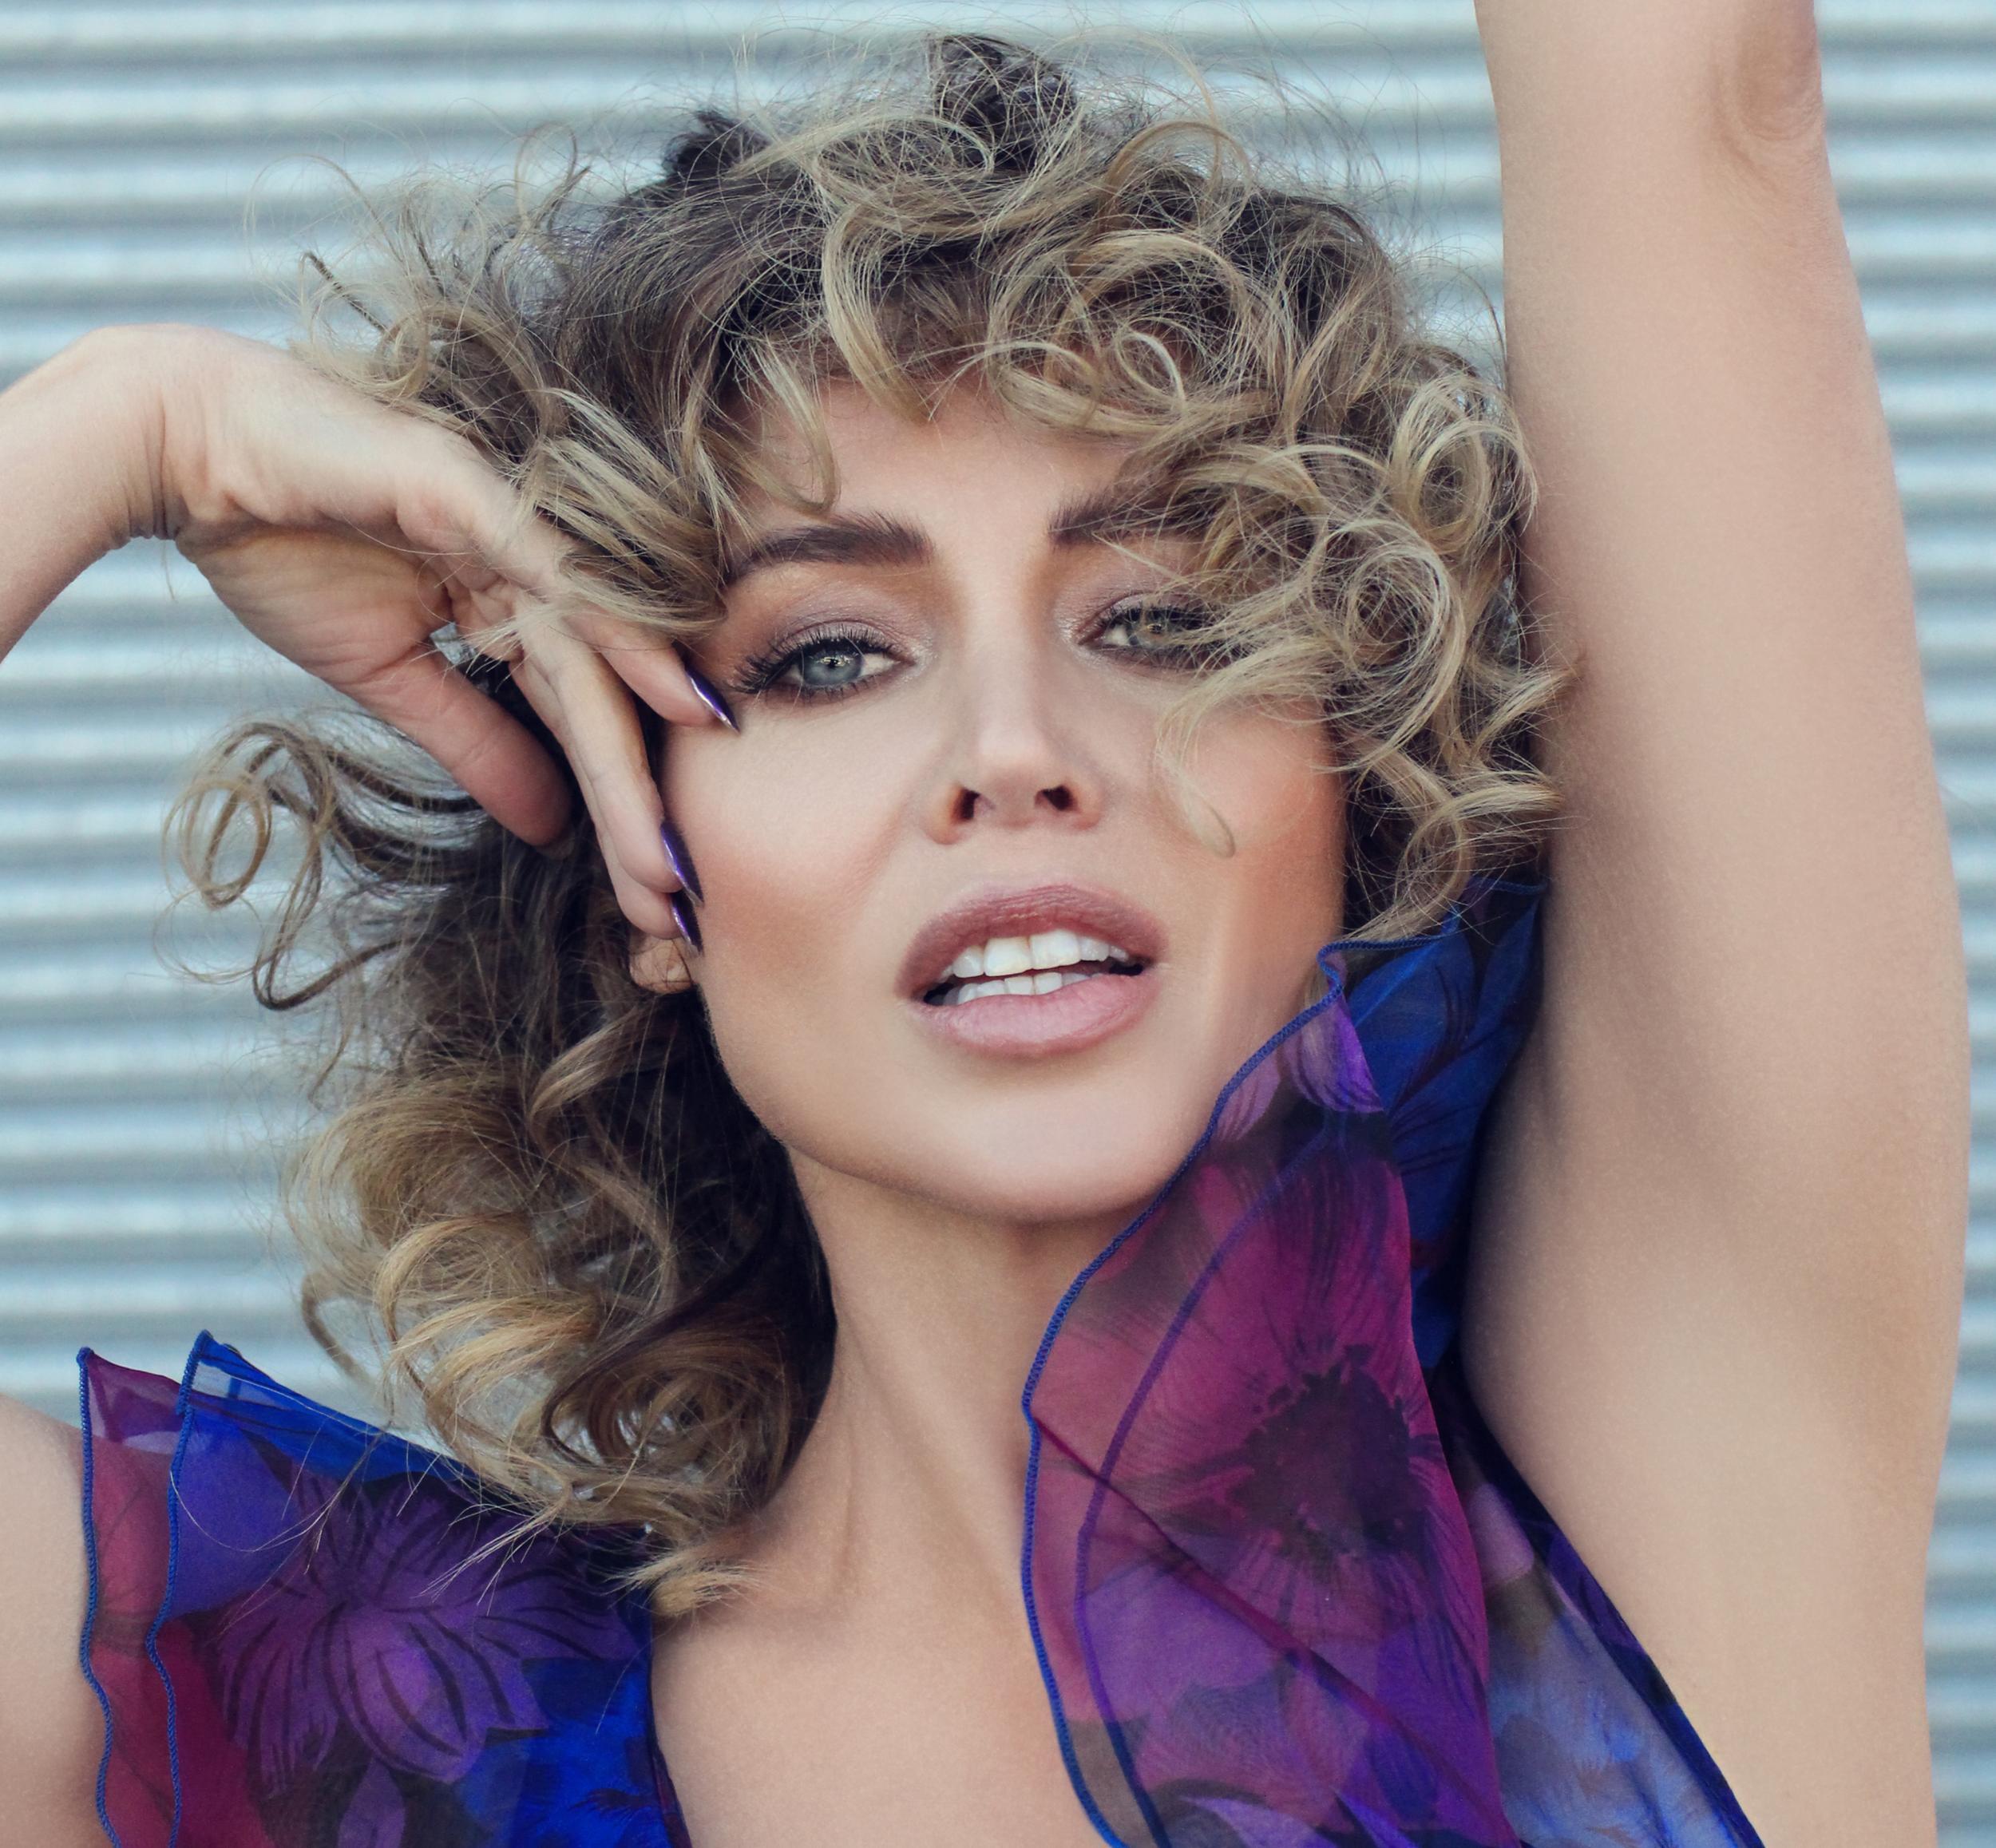 Dannii Minogue nude (38 photo), Sexy, Hot, Feet, bra 2015